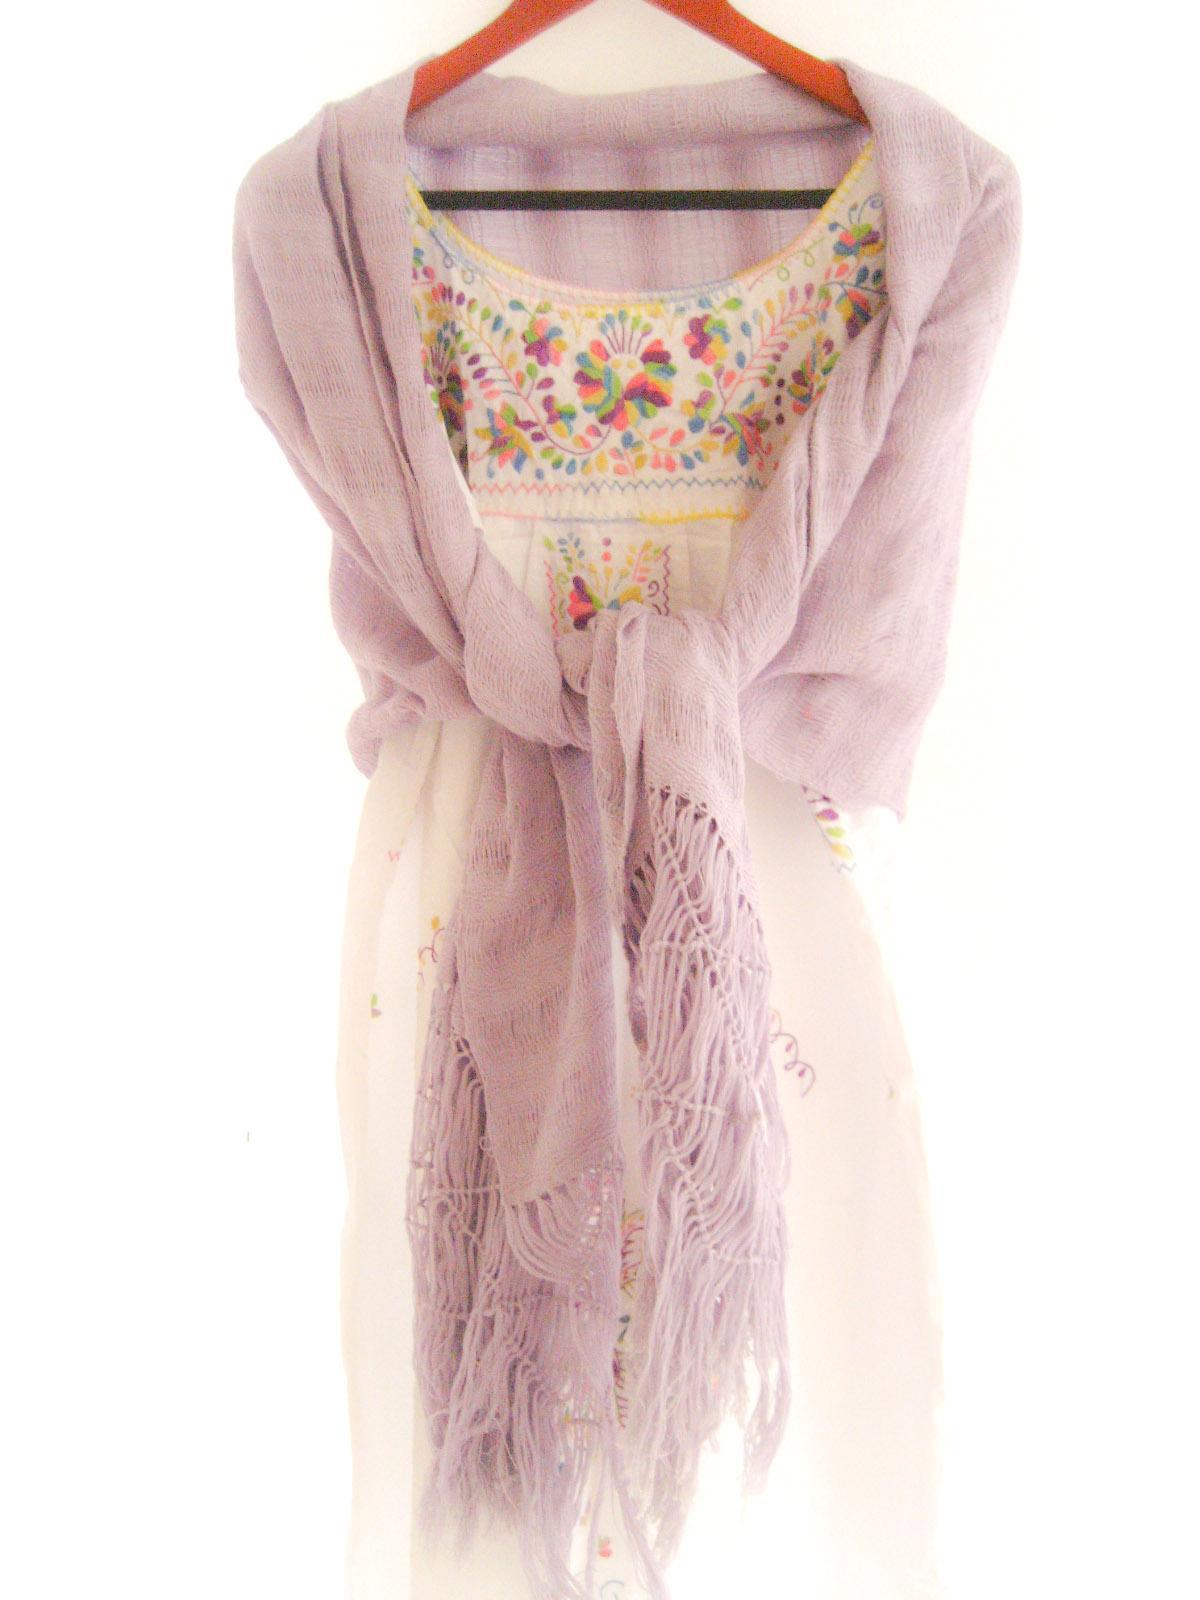 Rebozo ethnic wrap lavender love